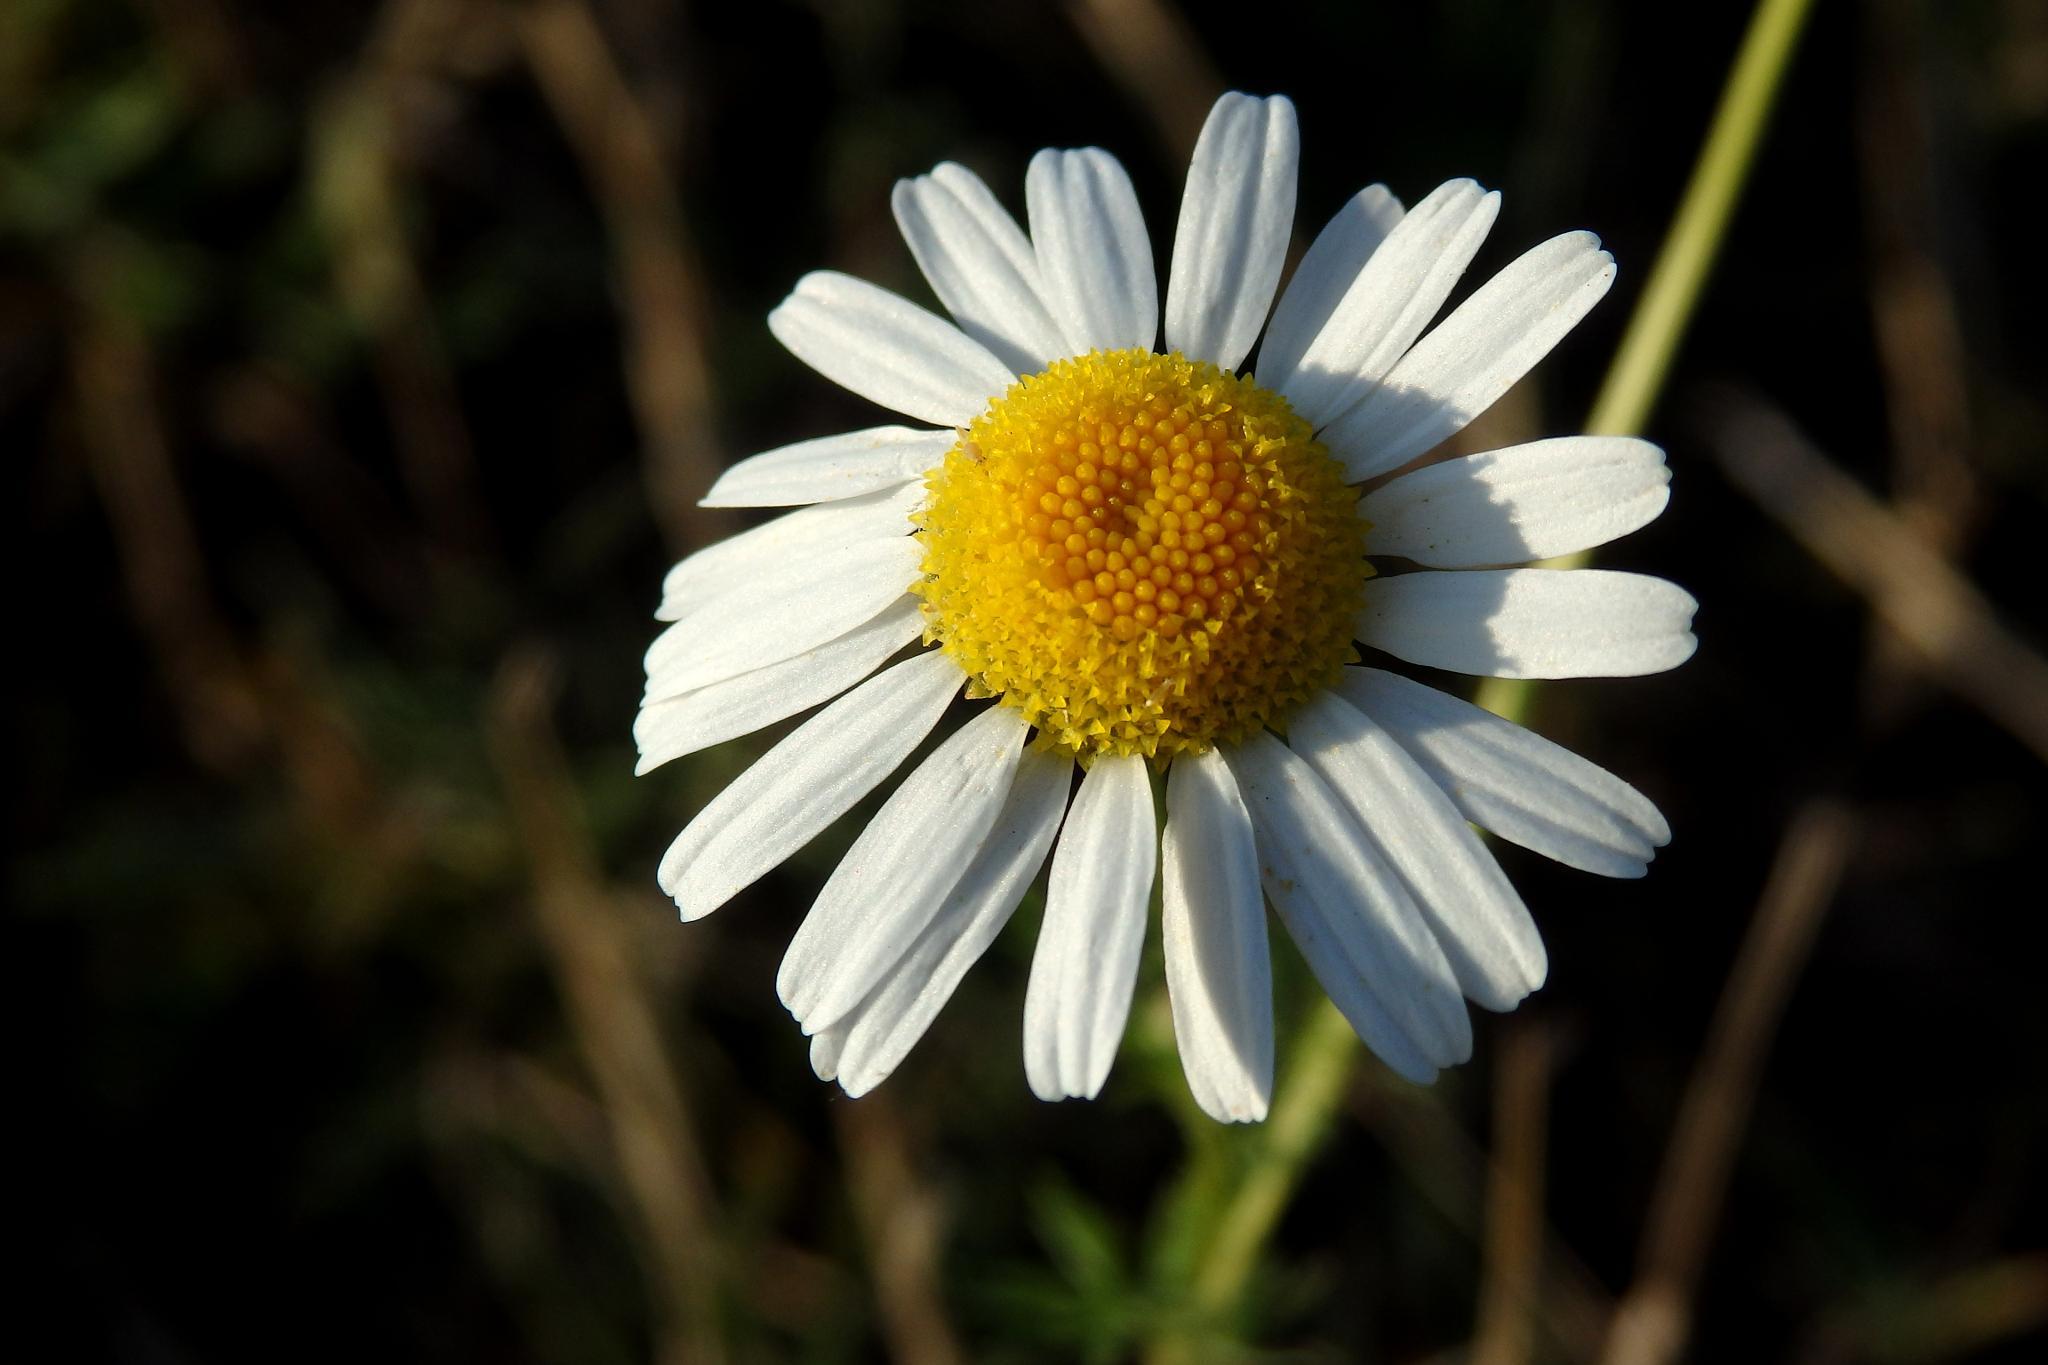 Daisy by AdrianIonescu